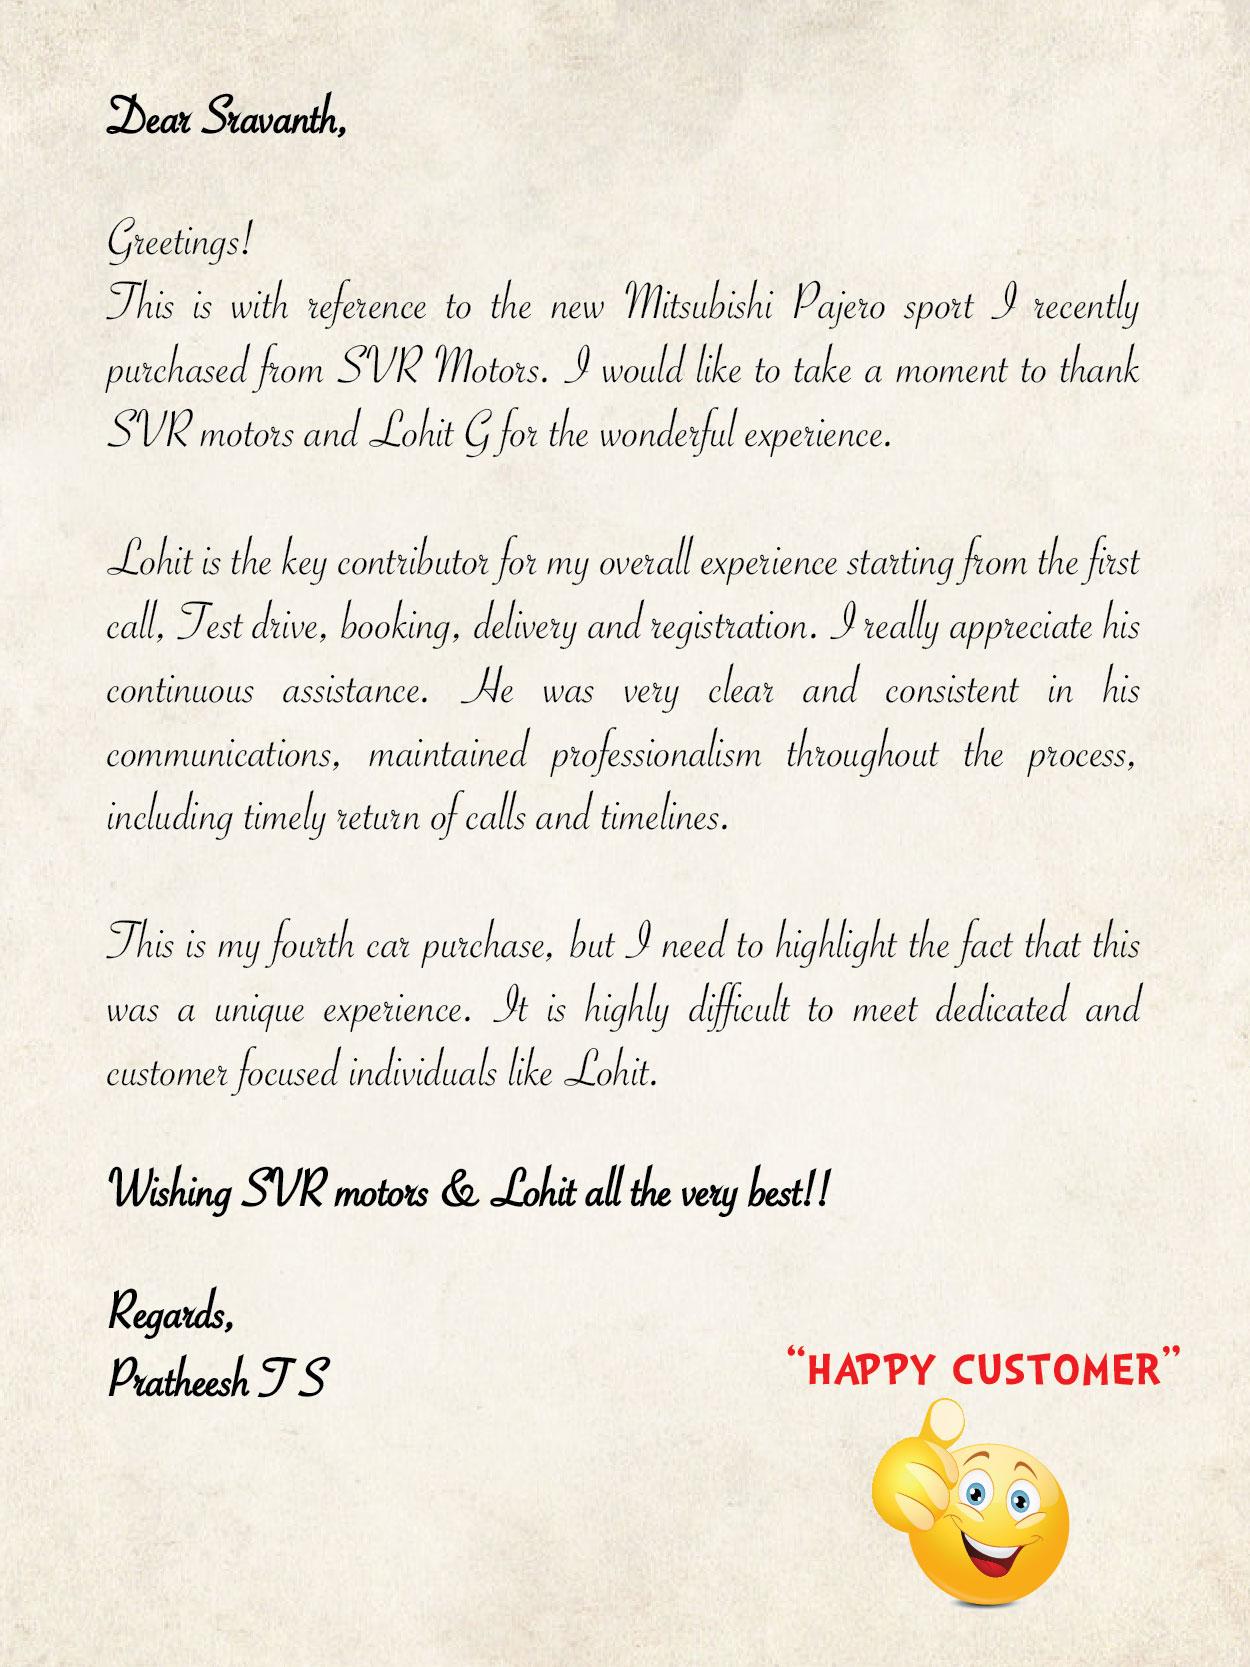 Customer delight pratheesh j s bangalore for Mitsubishi motors customer service